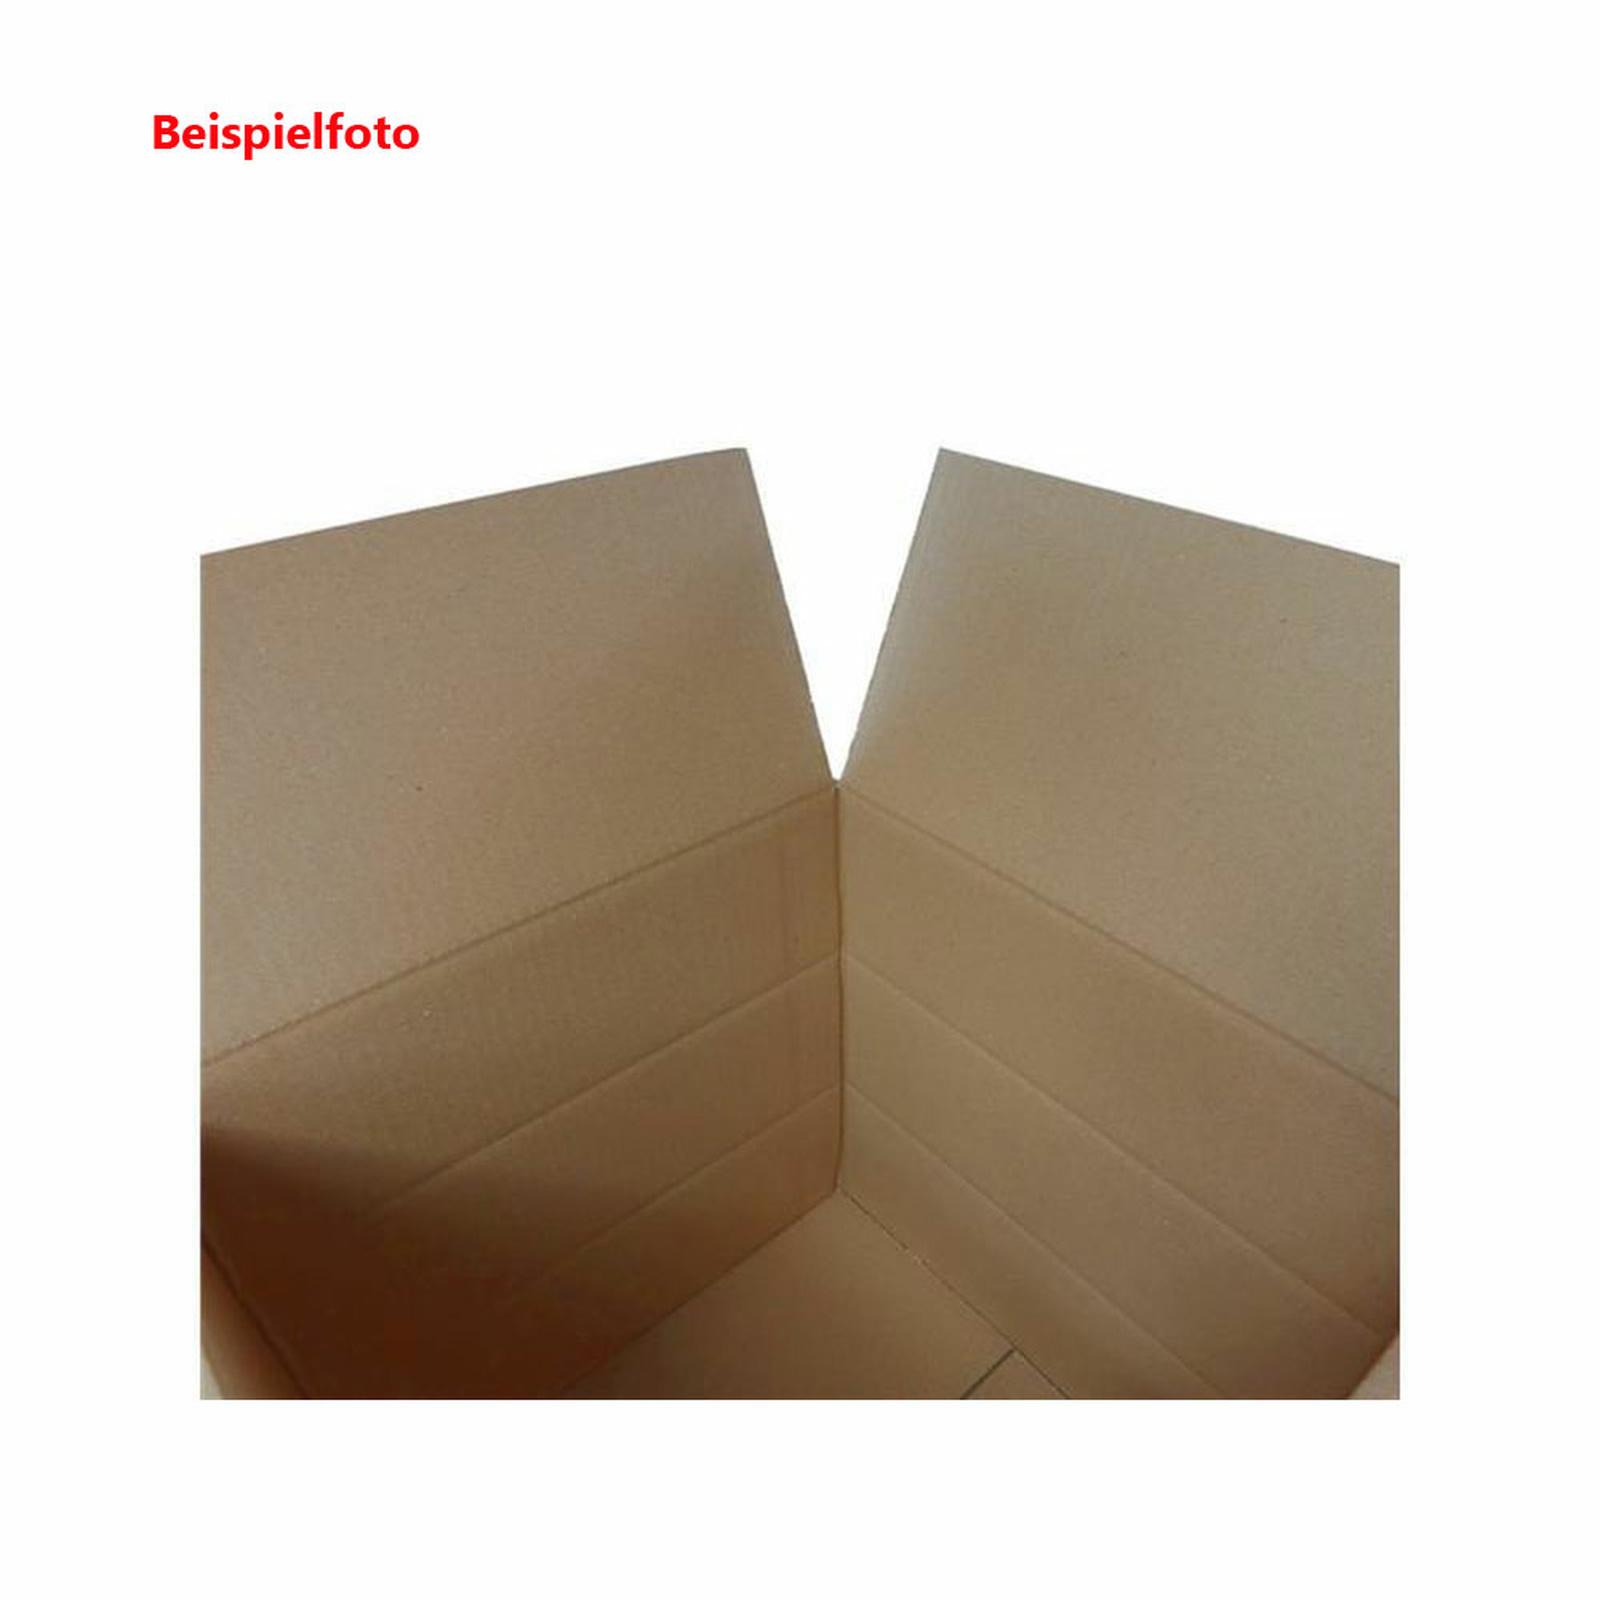 zweiwellige kartons 400x300x150 300 mm g nstig kaufen 0 88. Black Bedroom Furniture Sets. Home Design Ideas